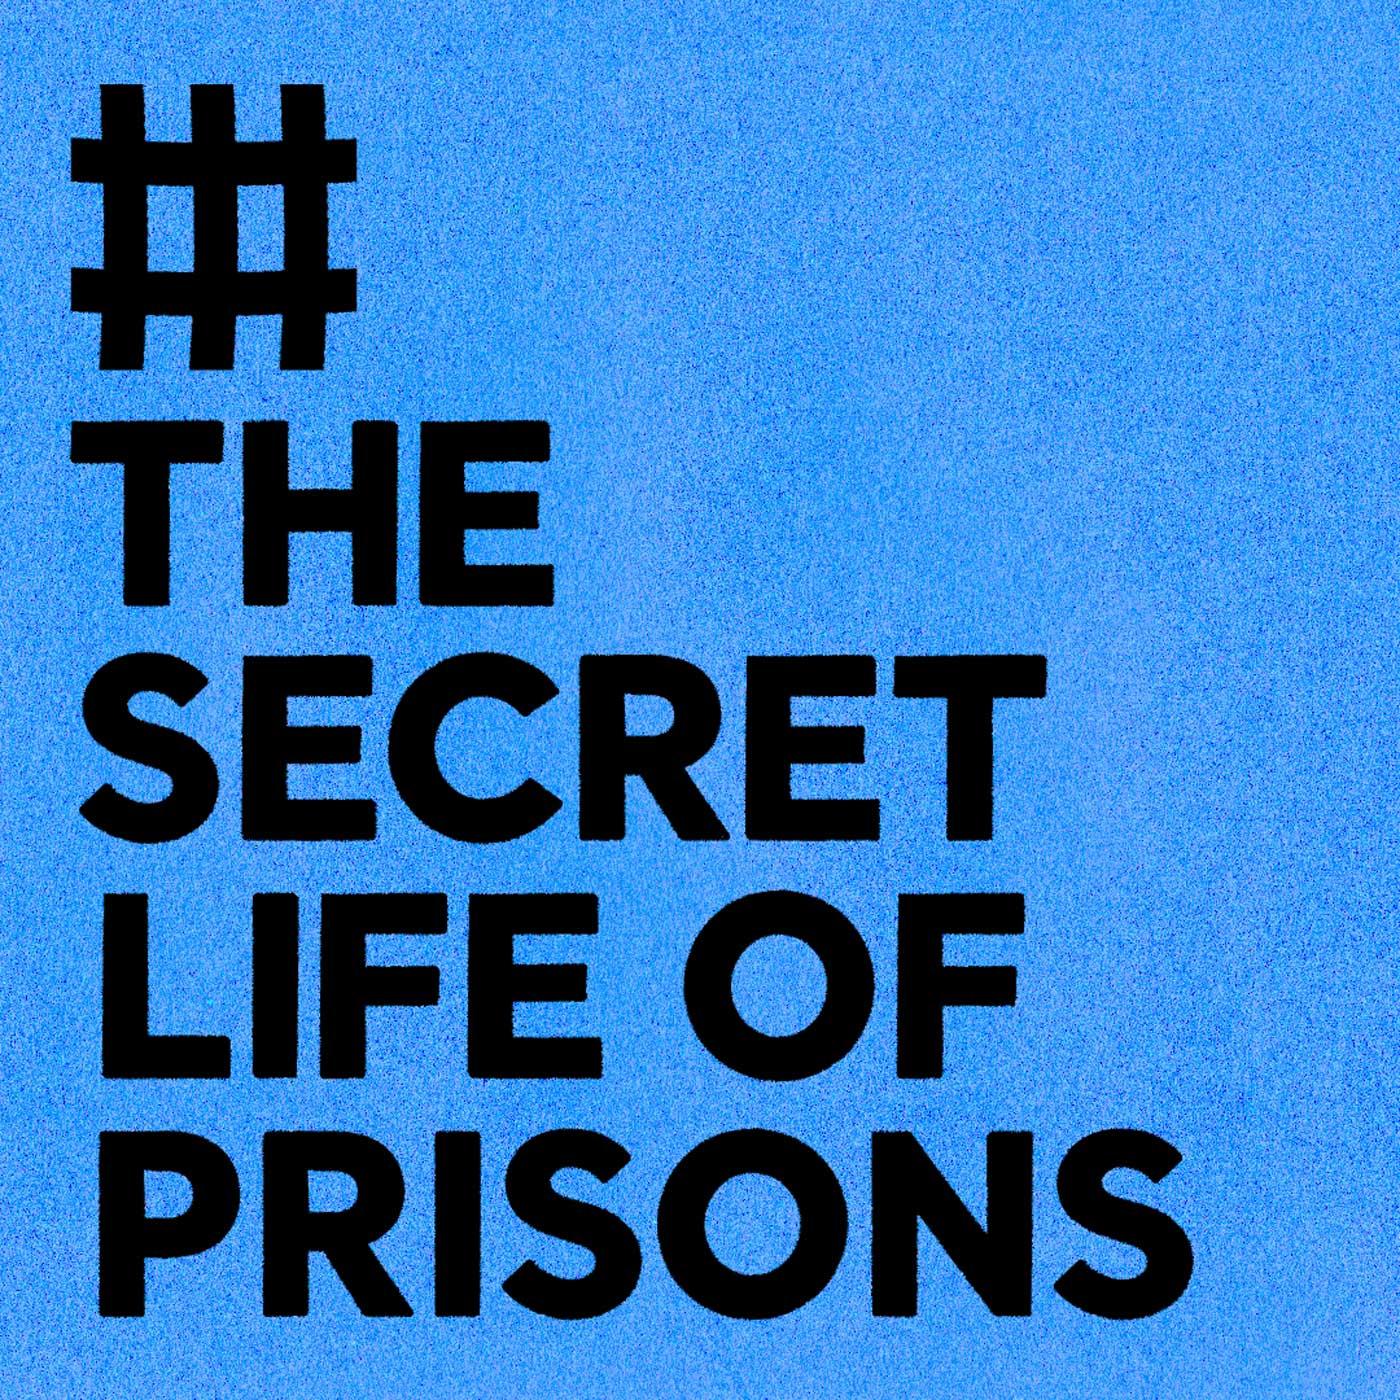 The Secret Life of Prisons podcast show art